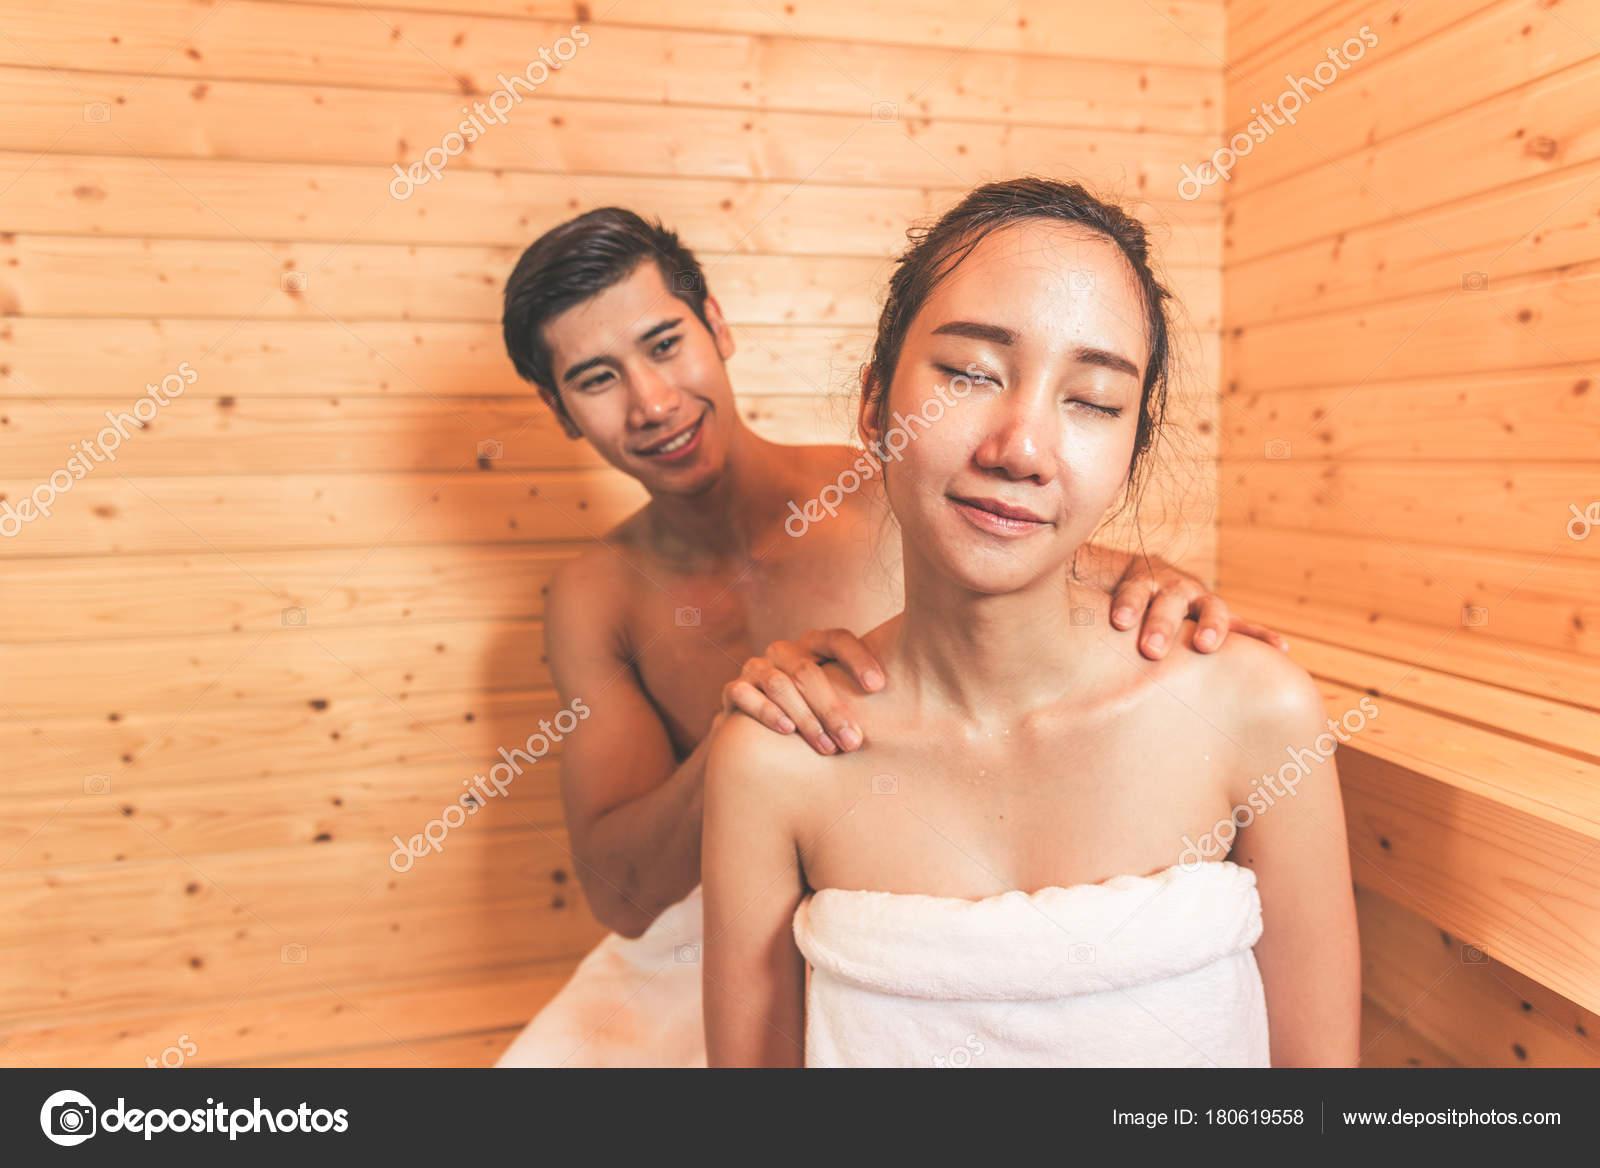 https://st3.depositphotos.com/12218988/18061/i/1600/depositphotos_180619558-stock-photo-young-asian-couples-or-lovers.jpg